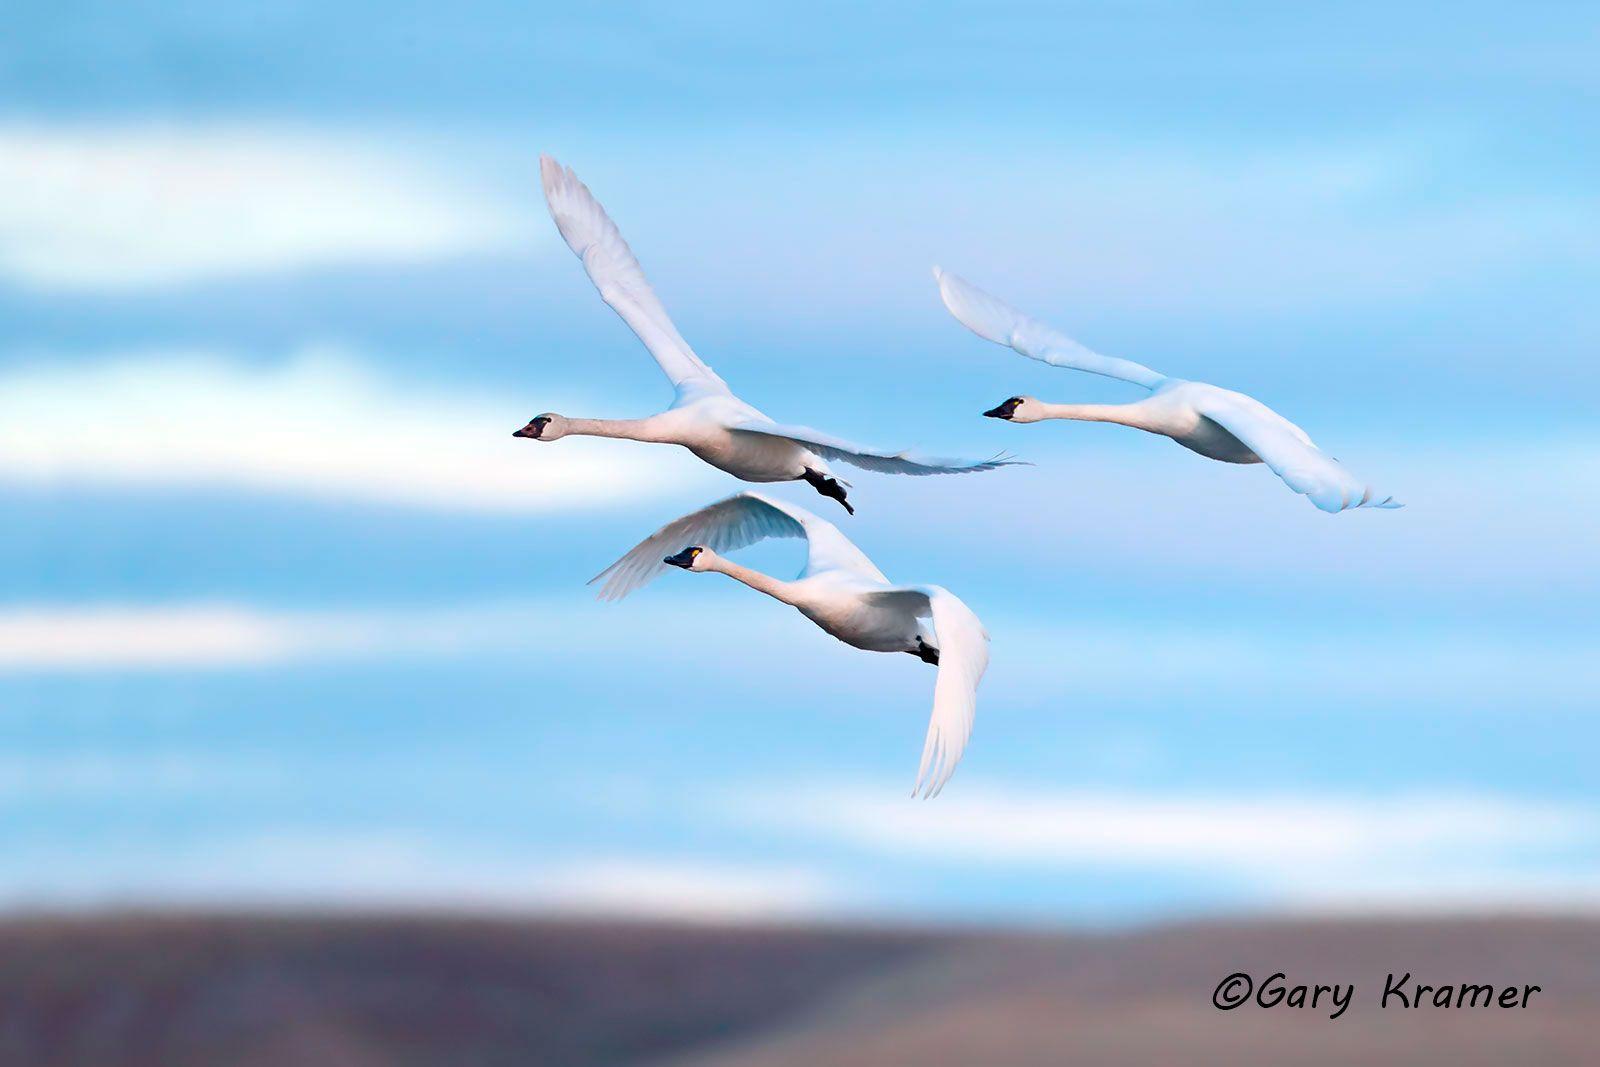 Tundra (Whistling) Swan (Cygnus columbianus) - NBWT#364d